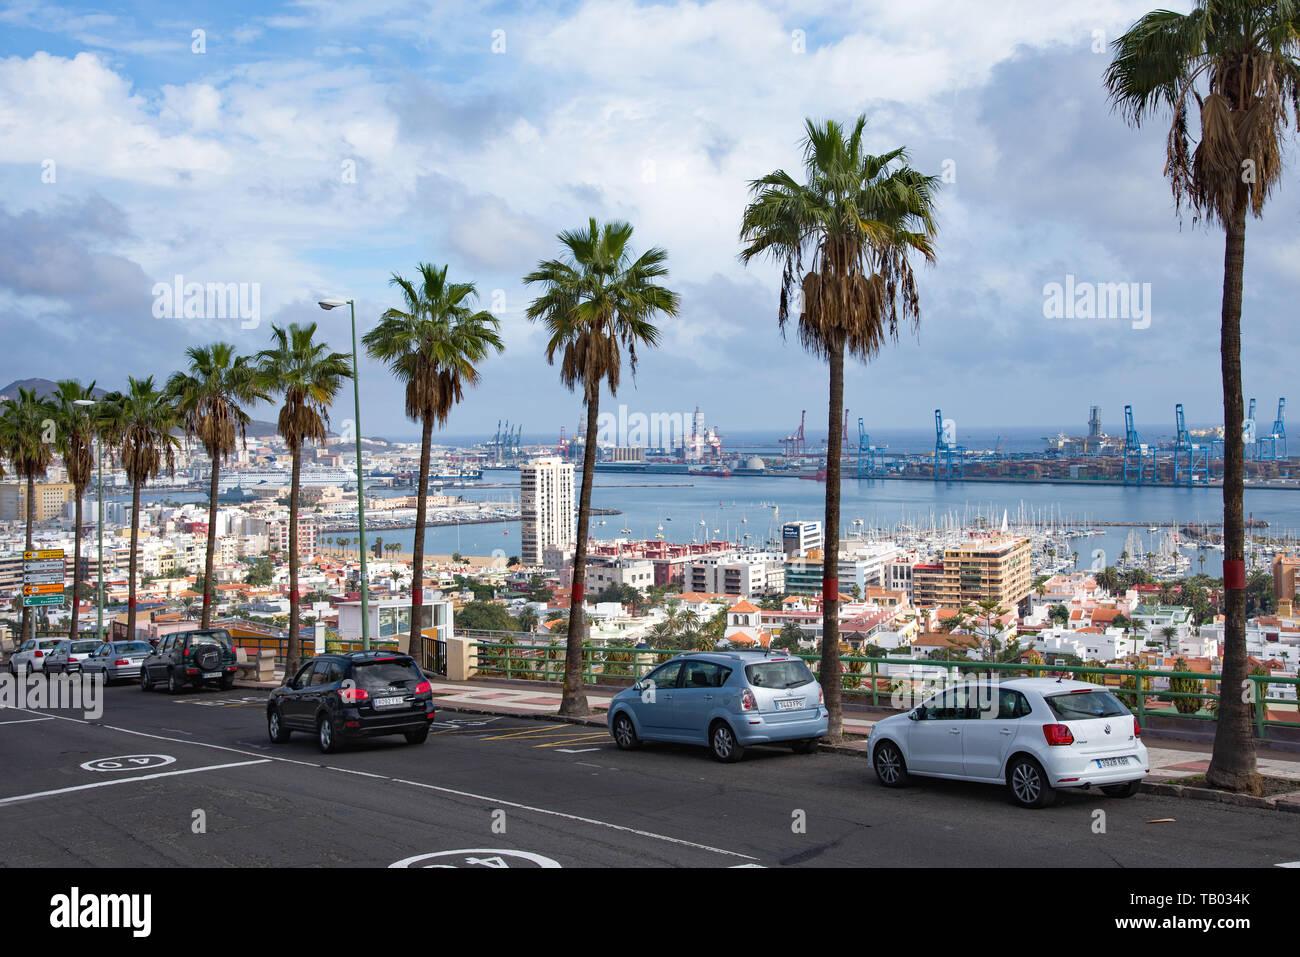 Mirador Paseo La Cornisa High Resolution Stock Photography And Images Alamy